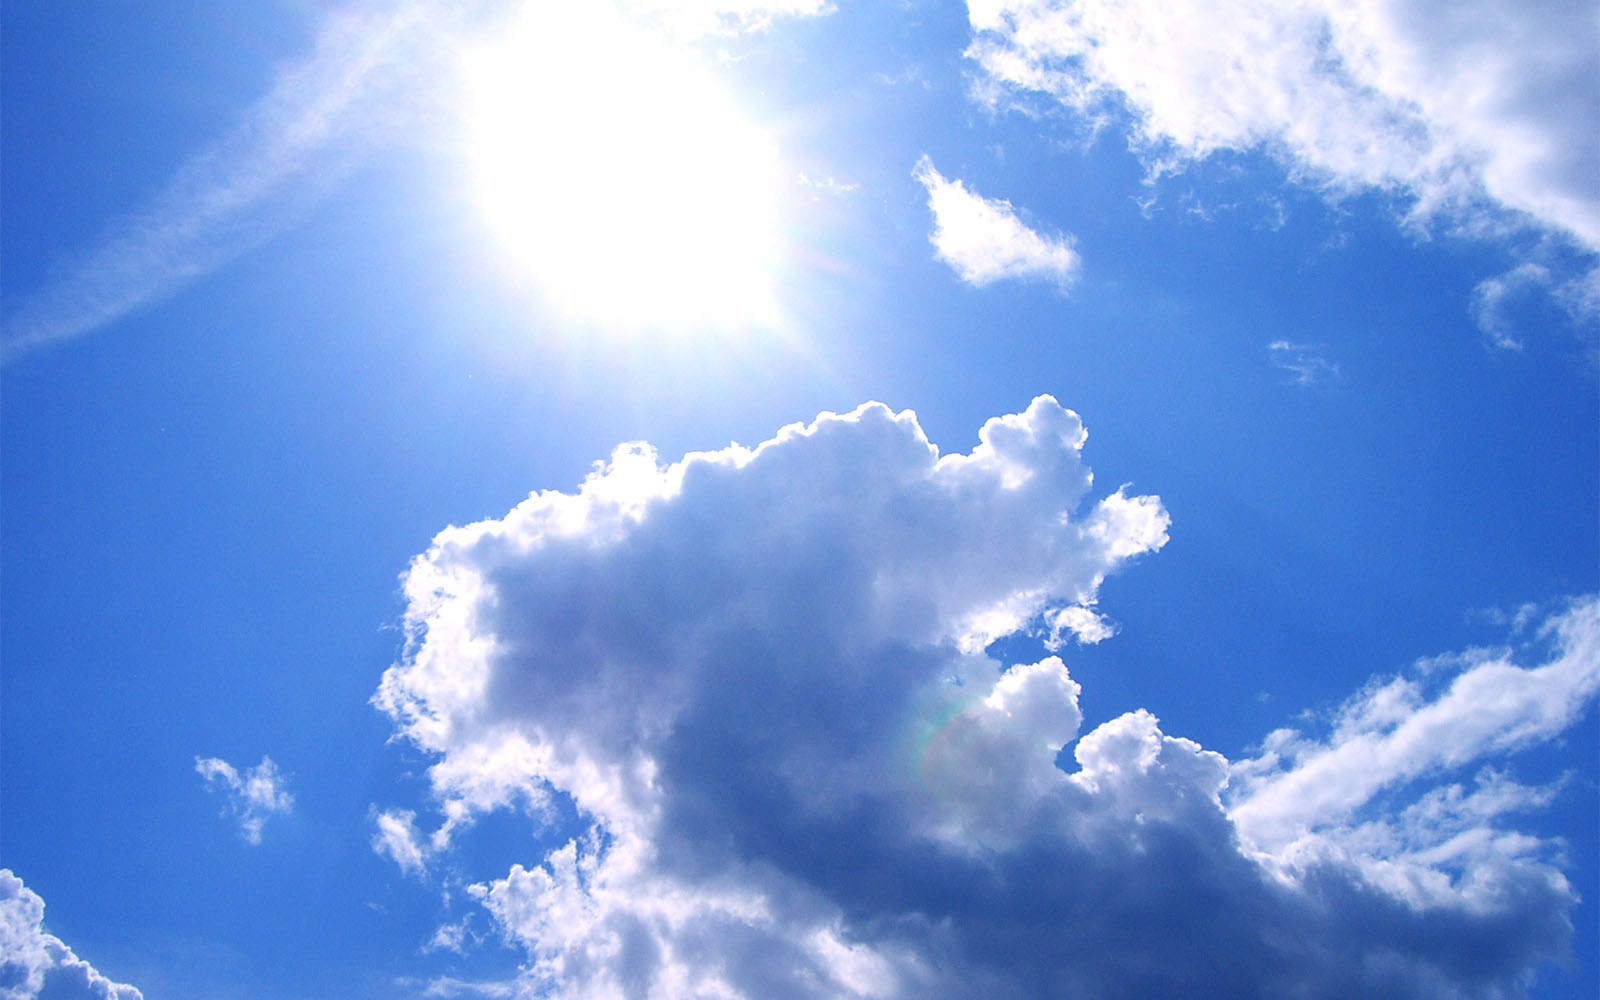 Wallpapers Sun And Clouds Desktop Backgrounds Sun And Clouds Photos 1600x1000